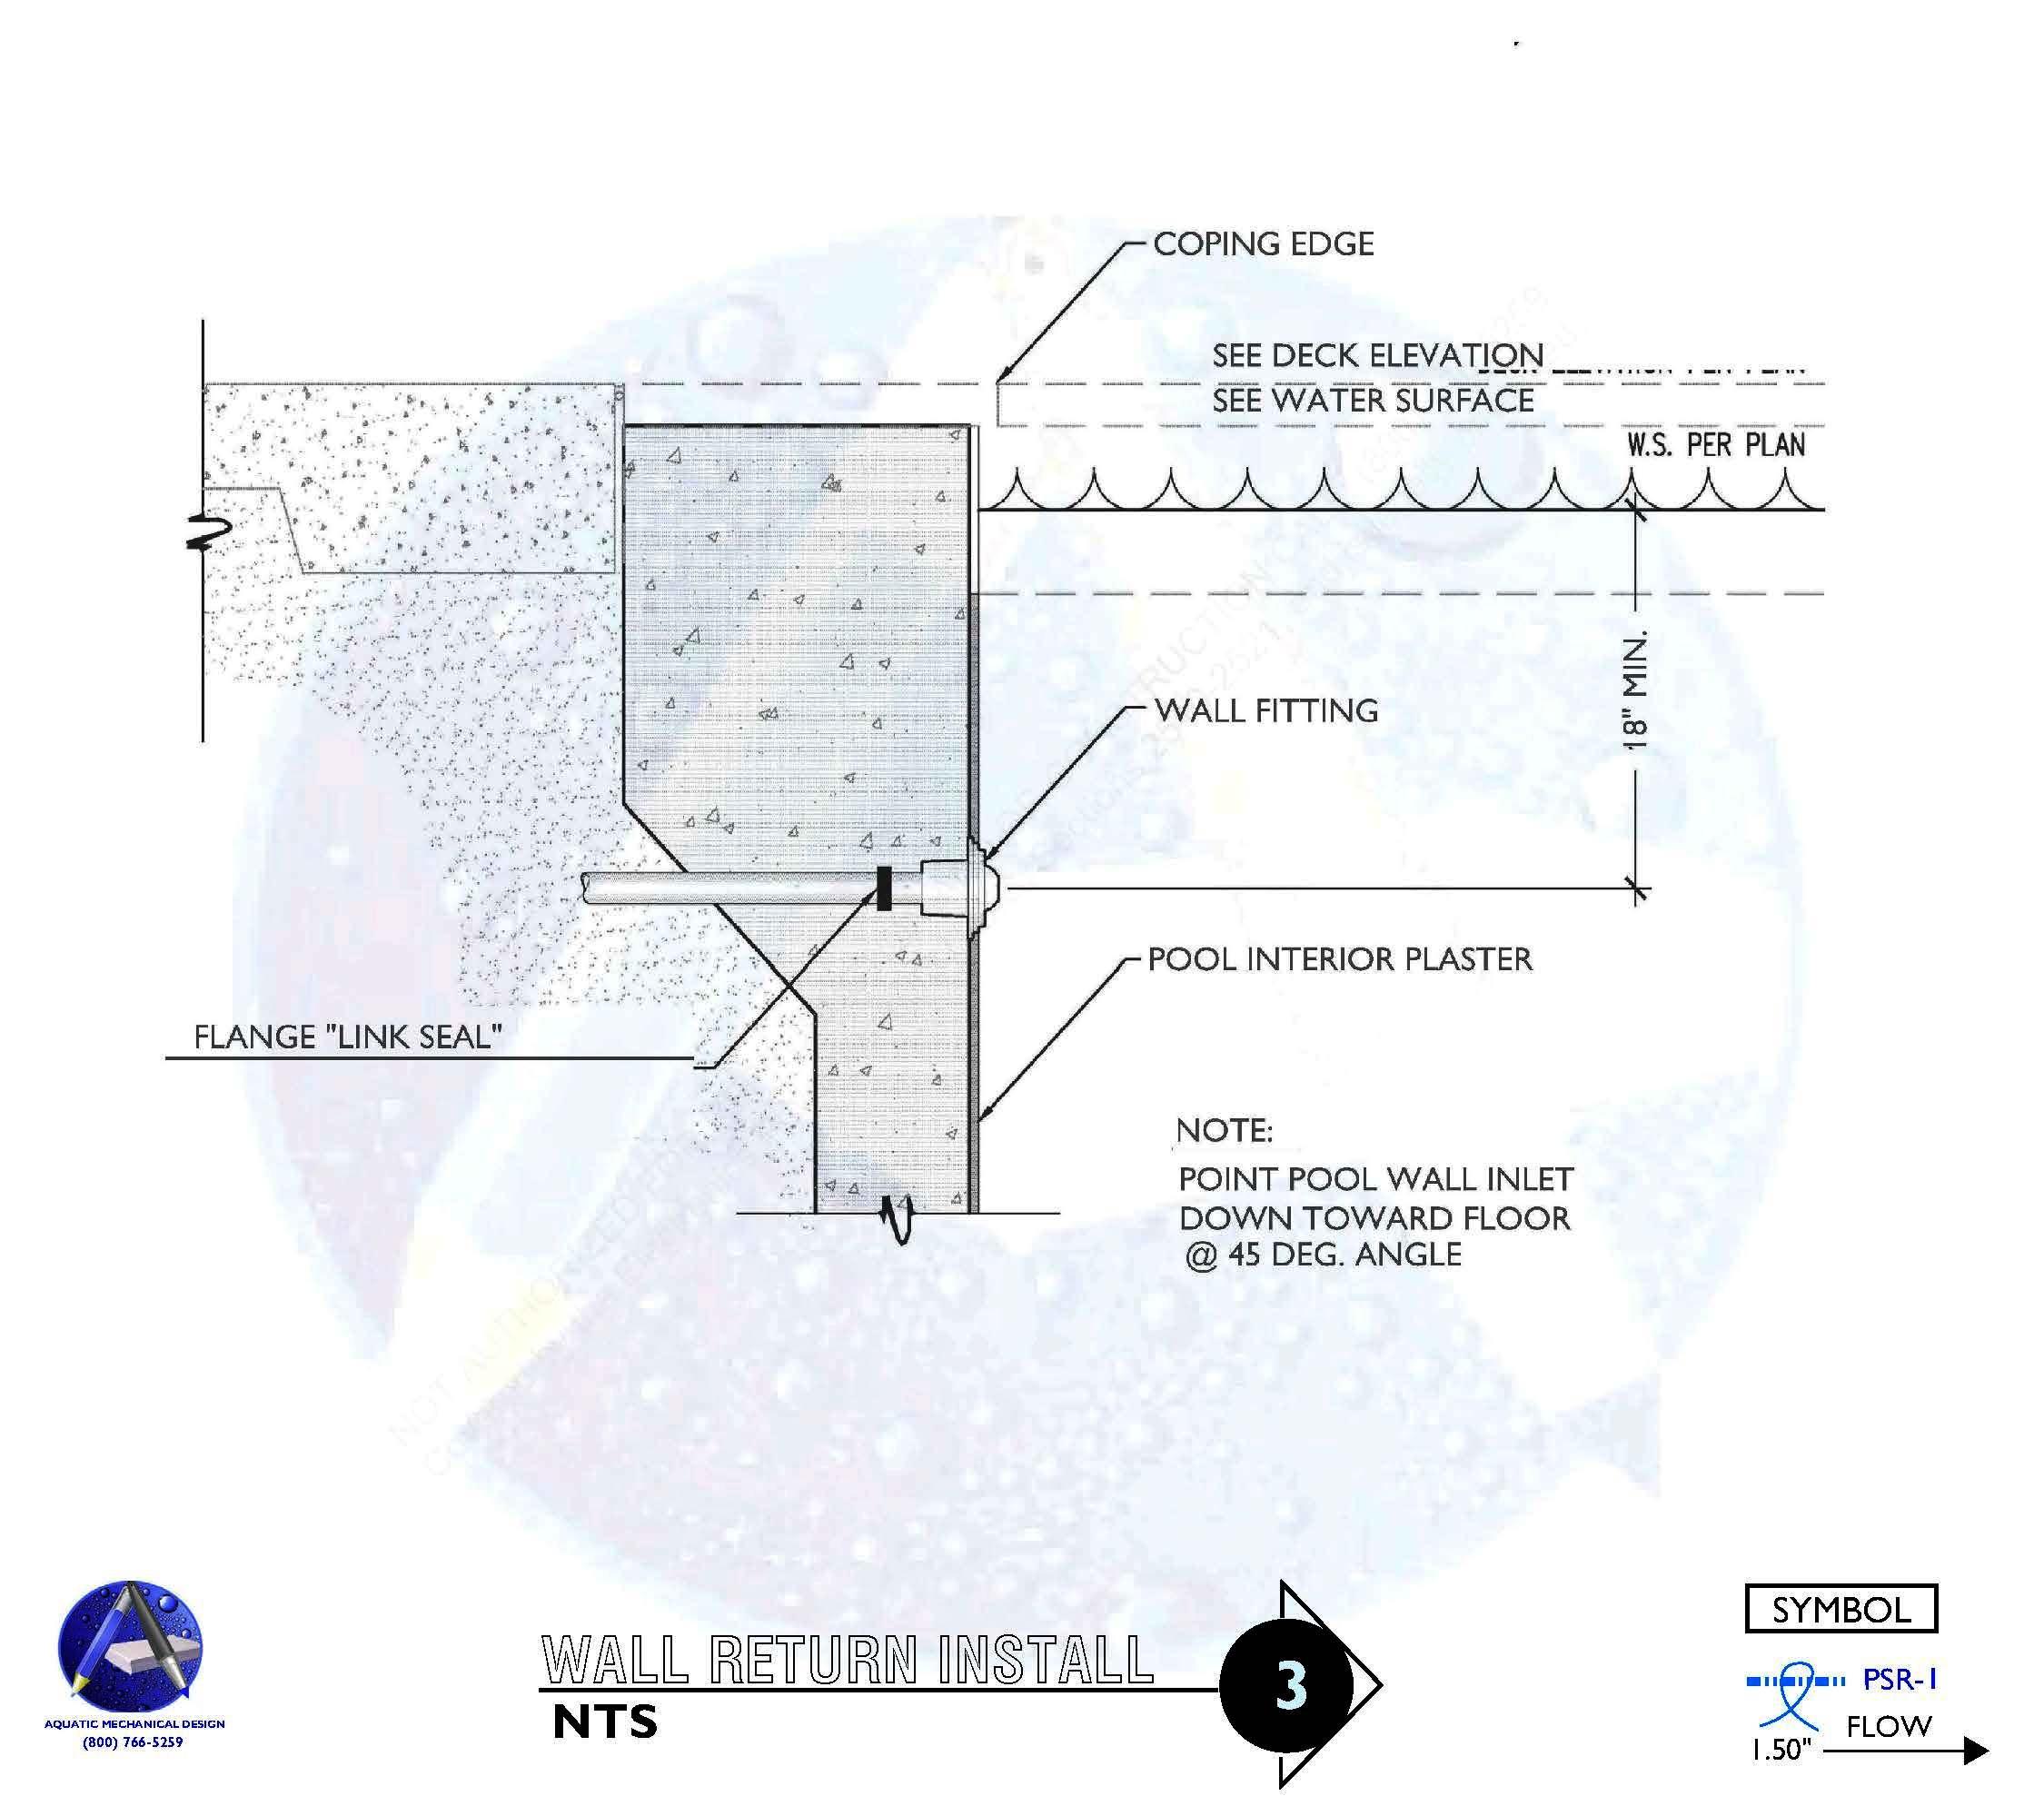 WALL RETURN DETAIL